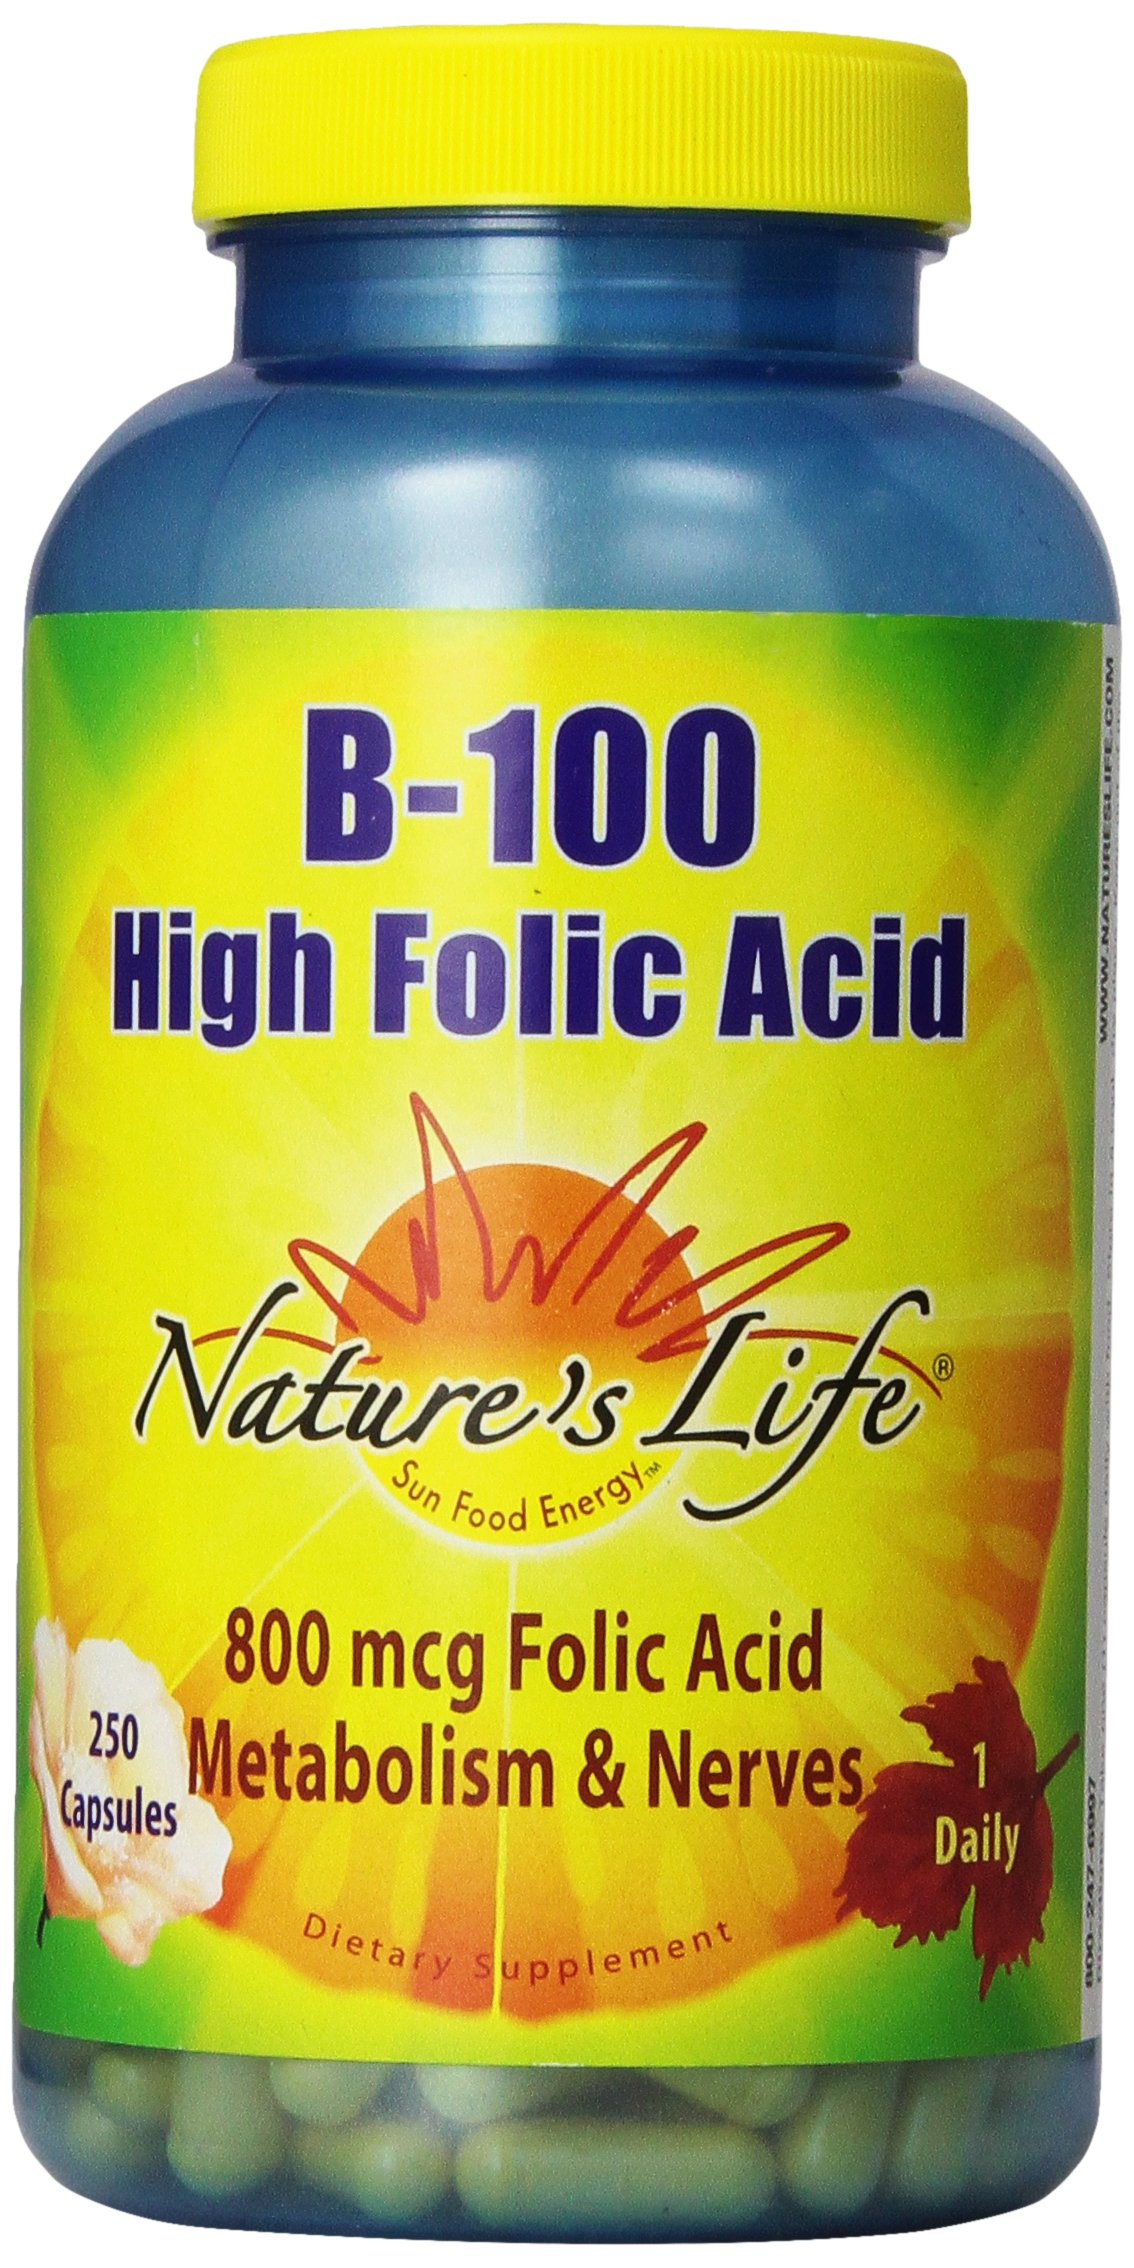 Nature's Life B-100, High Folic Acid,  250 Capsules